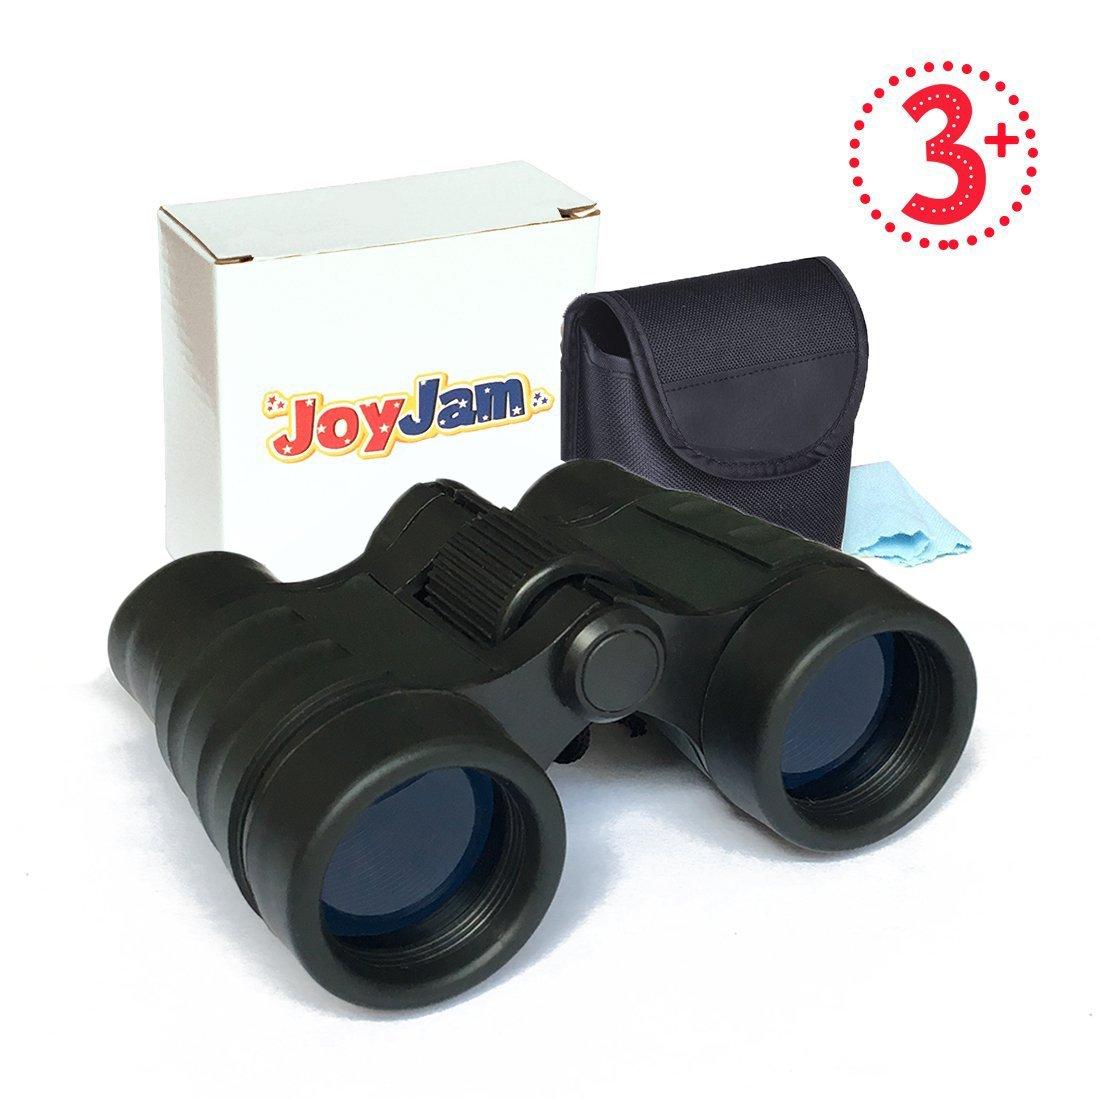 Joyjamコンパクト耐衝撃子供用双眼鏡、Best Gift For Boys & Girls (マルチカラー) B07C9G8TP6  ブラック